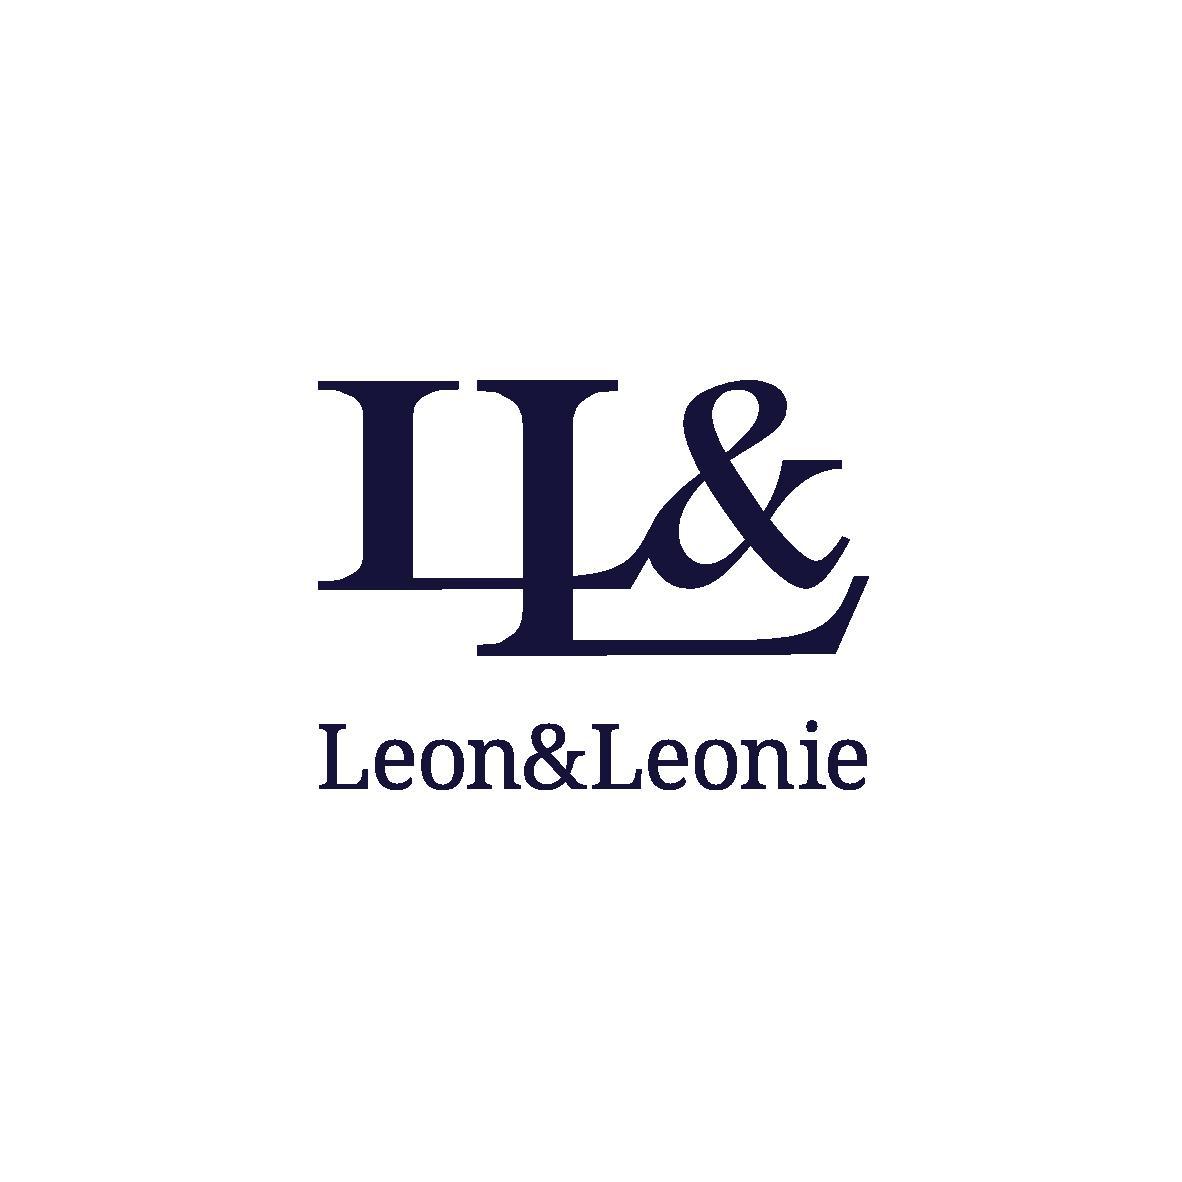 Leon & Leonie